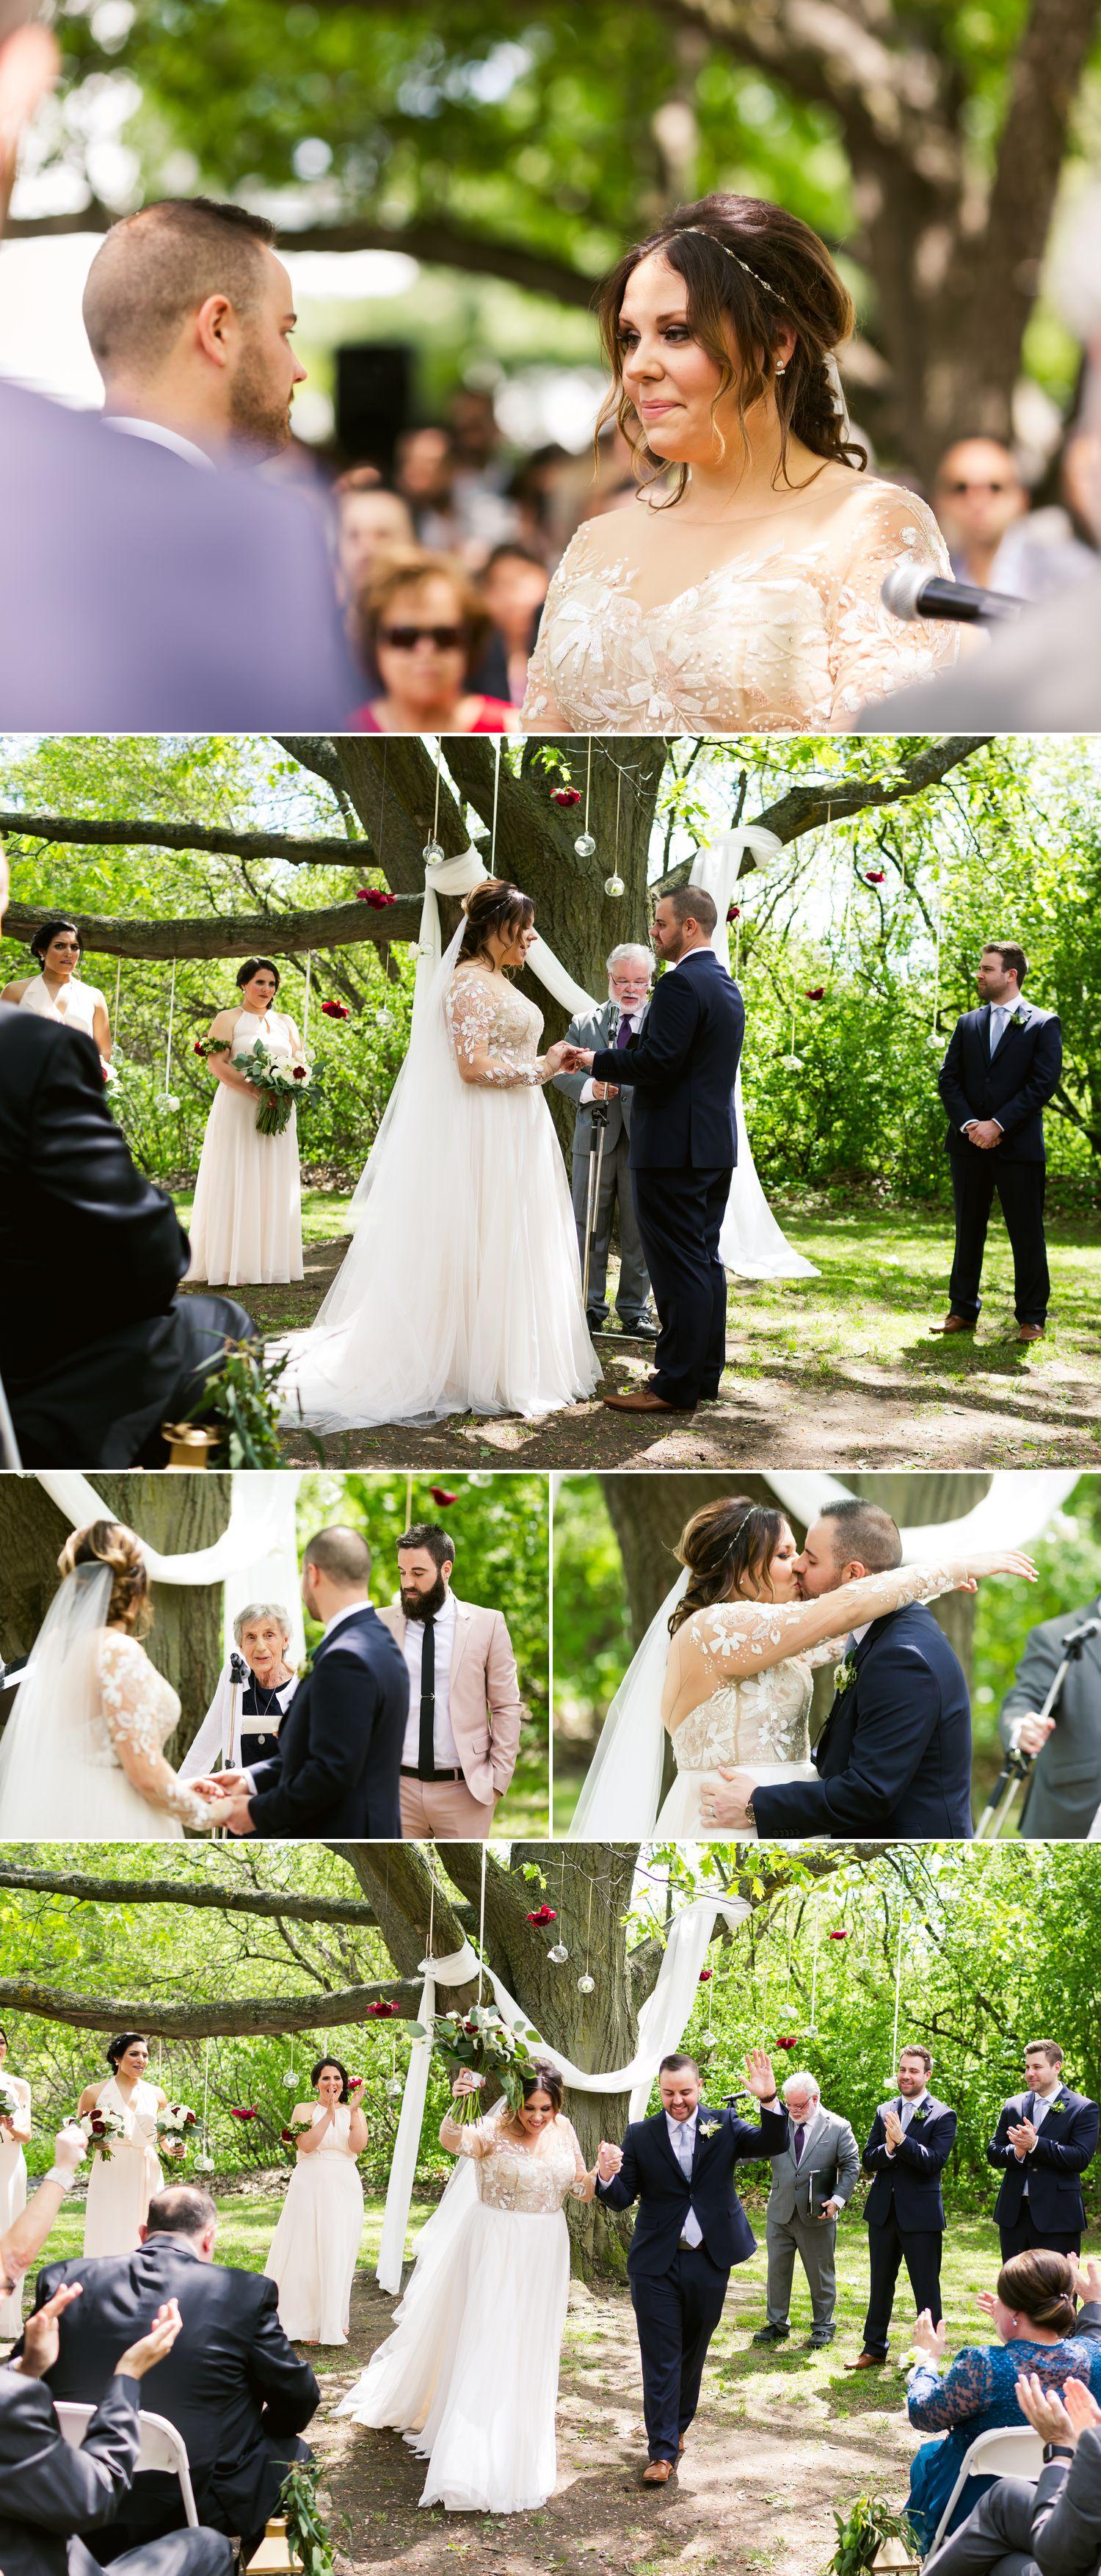 An outdoor spring wedding at Billings Estate in Ottawa